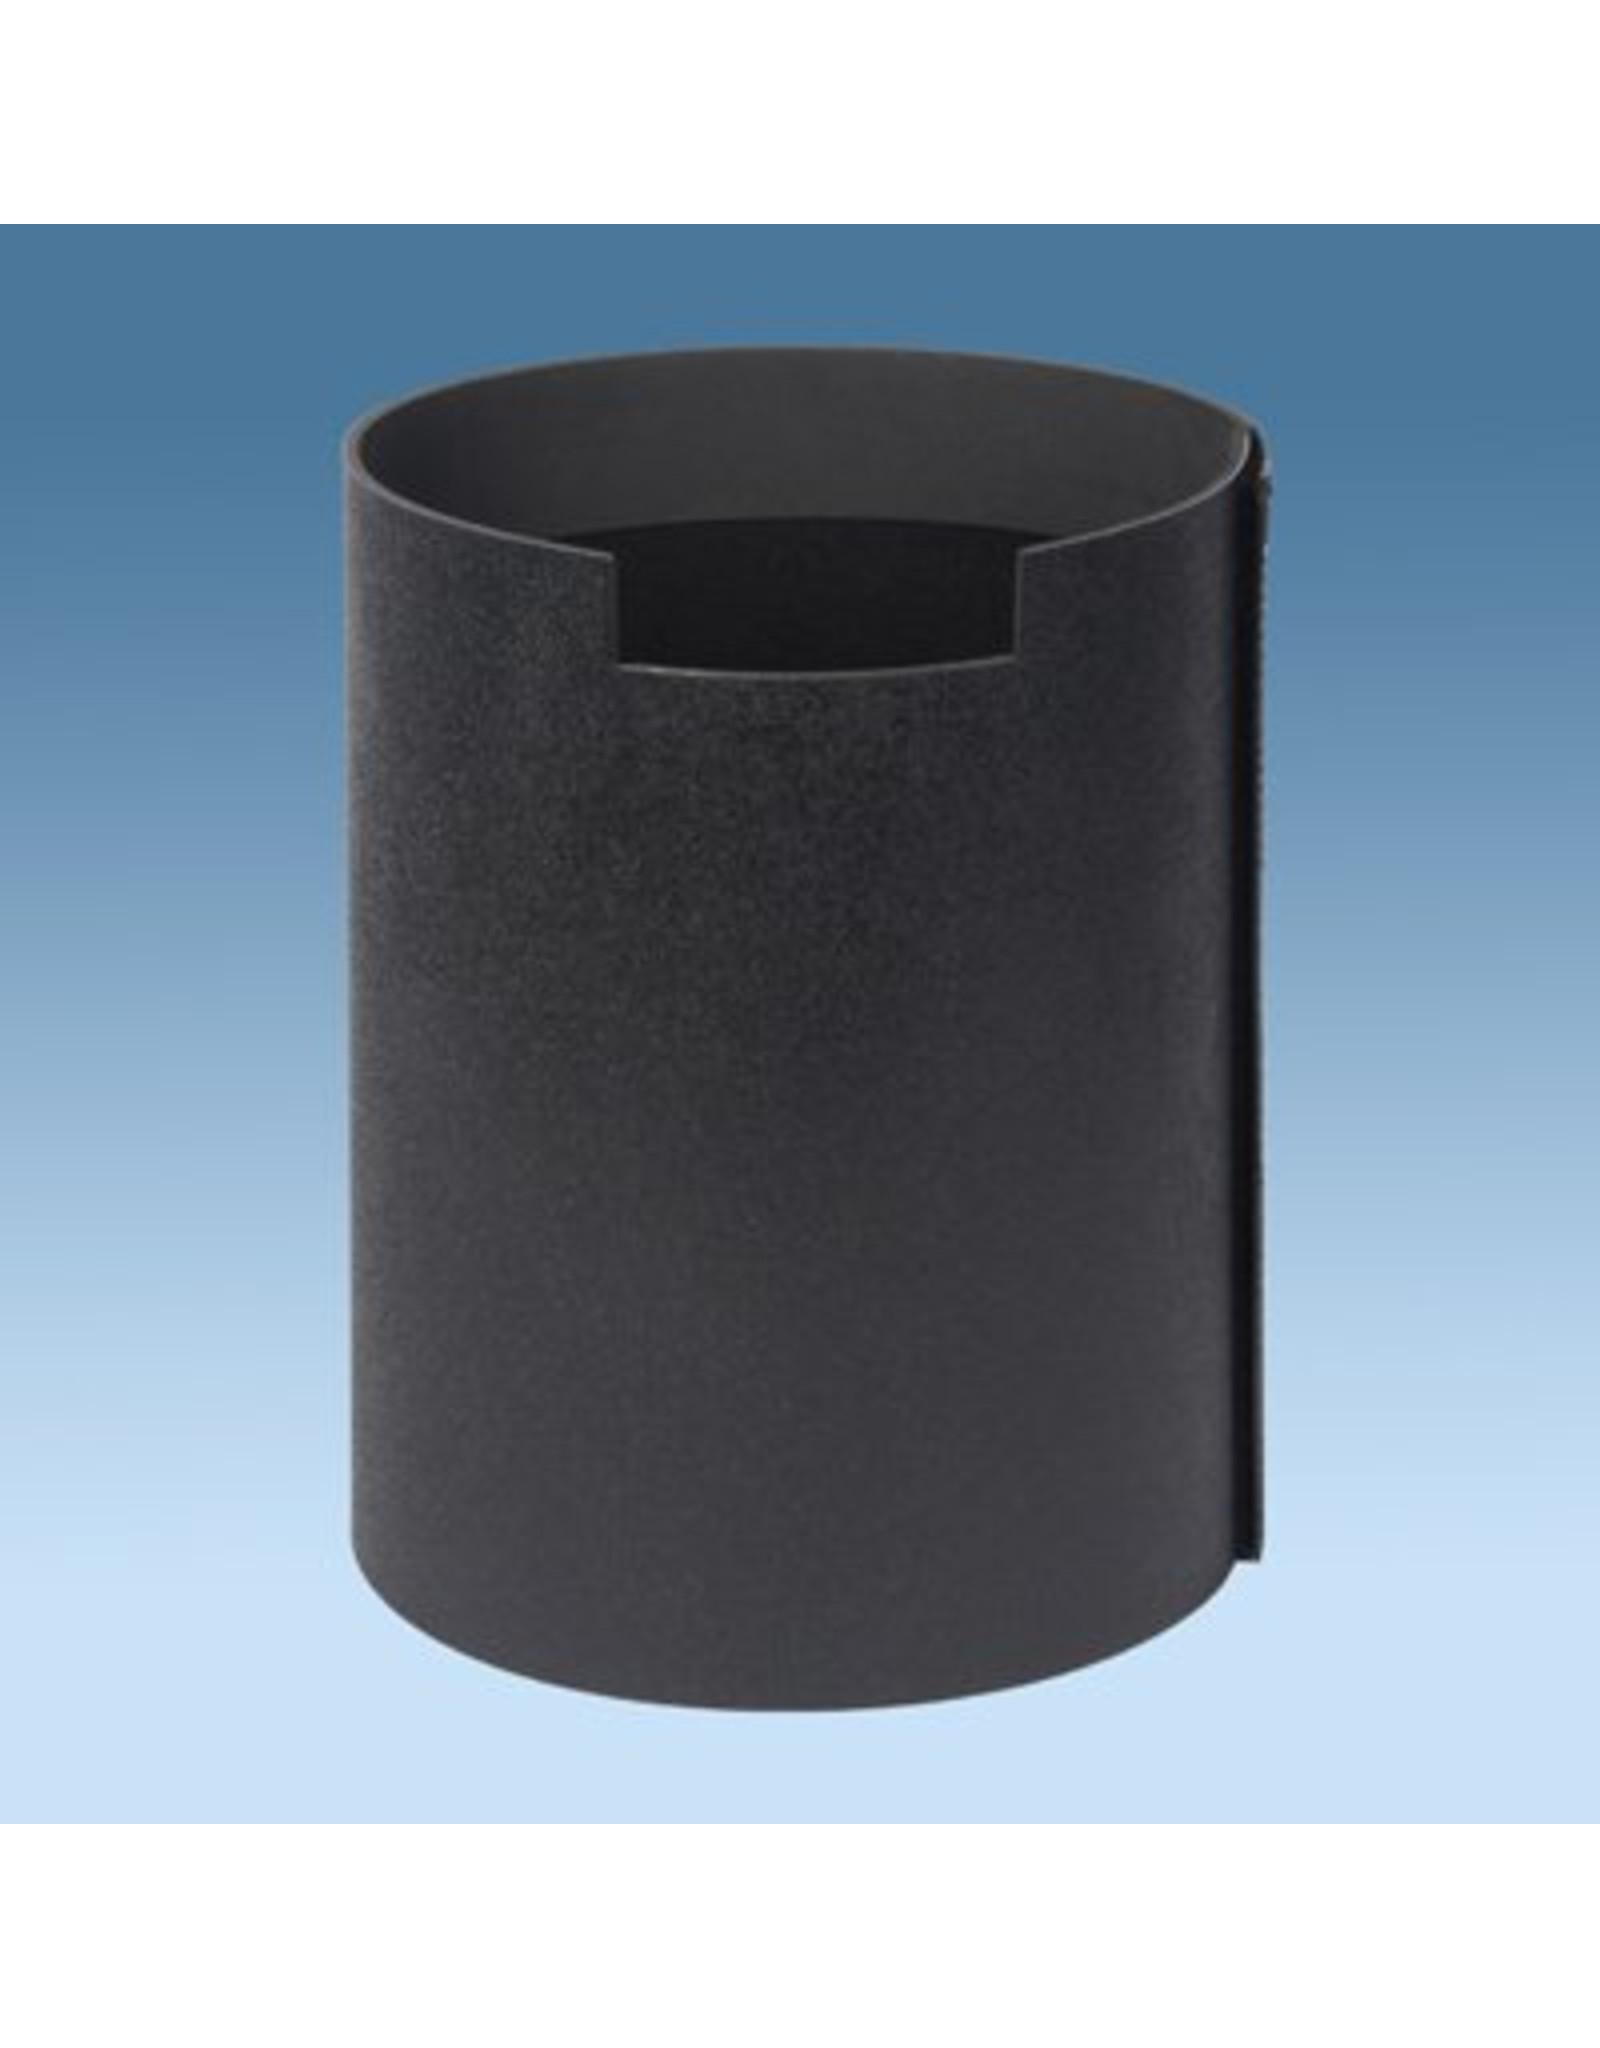 Astrozap Celestron 8 SCT and RASA Flexi-Shield™ Flexible Dew Shield - with Lower Dovetail Notch